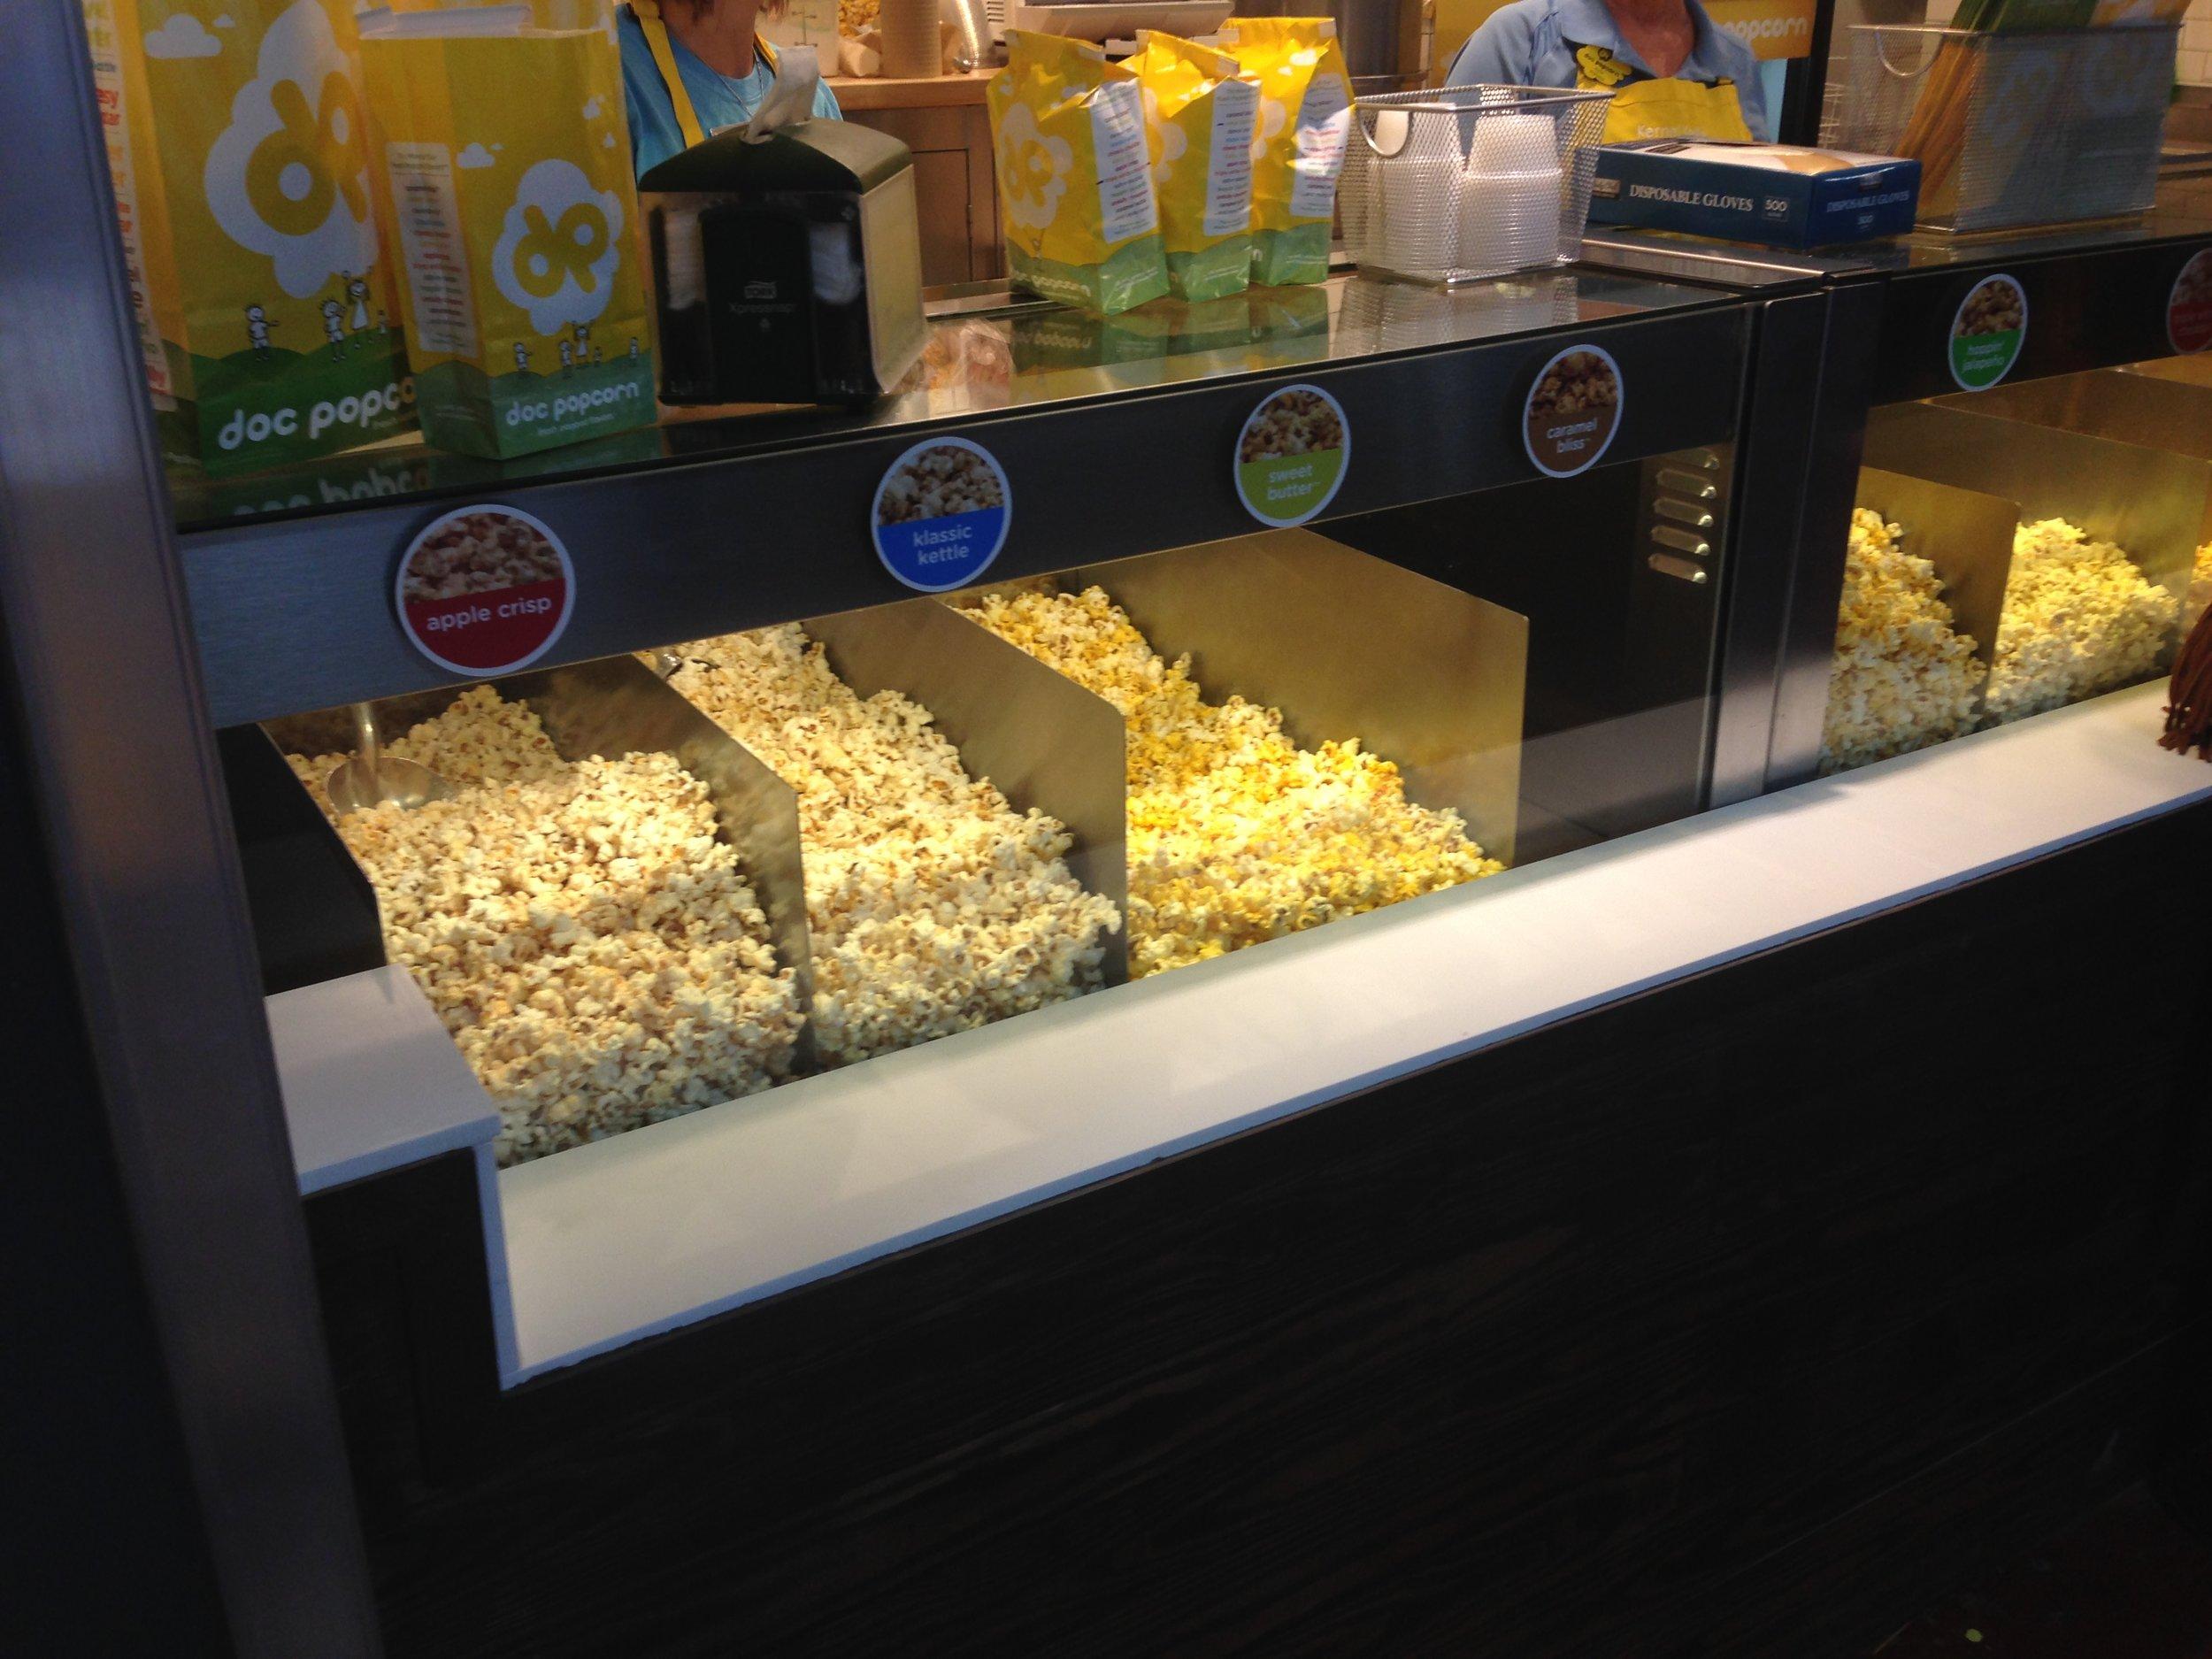 Popcorn kept hot and fresh